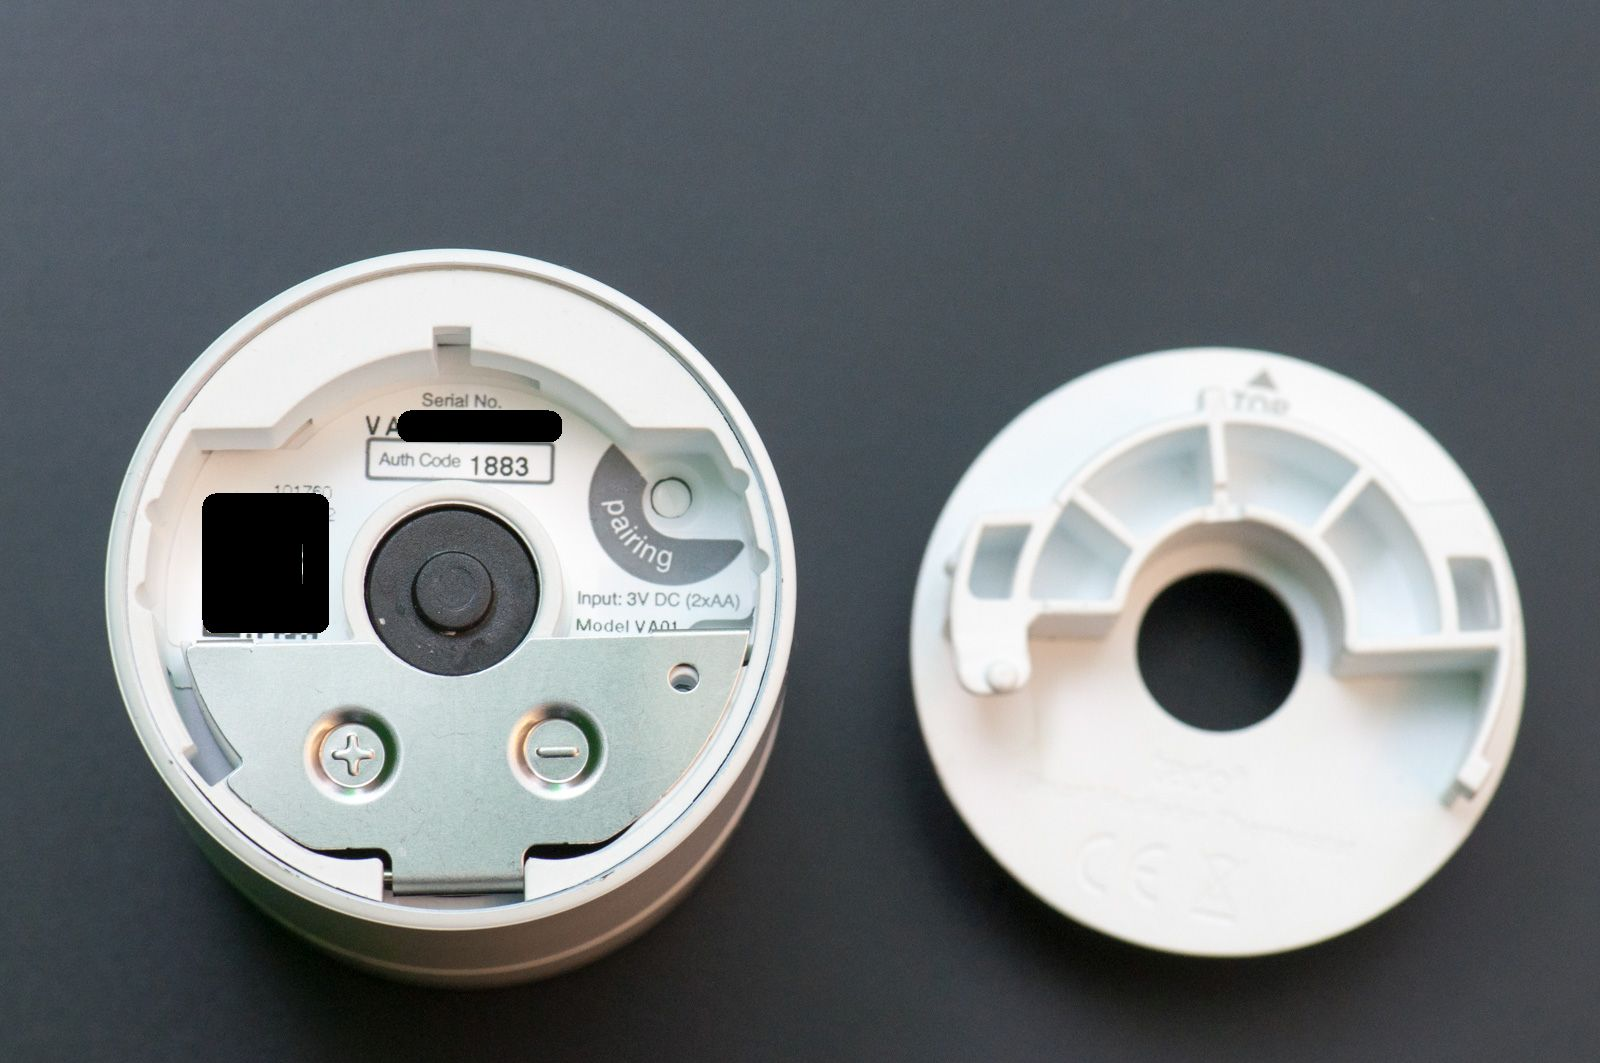 Tado im Test: Heizkörperthermostate mit effizientem Stalker-Modus - Der Koppelmechanismus ist auch recht platzsparend. (Foto: Andreas Sebayang/Golem.de)